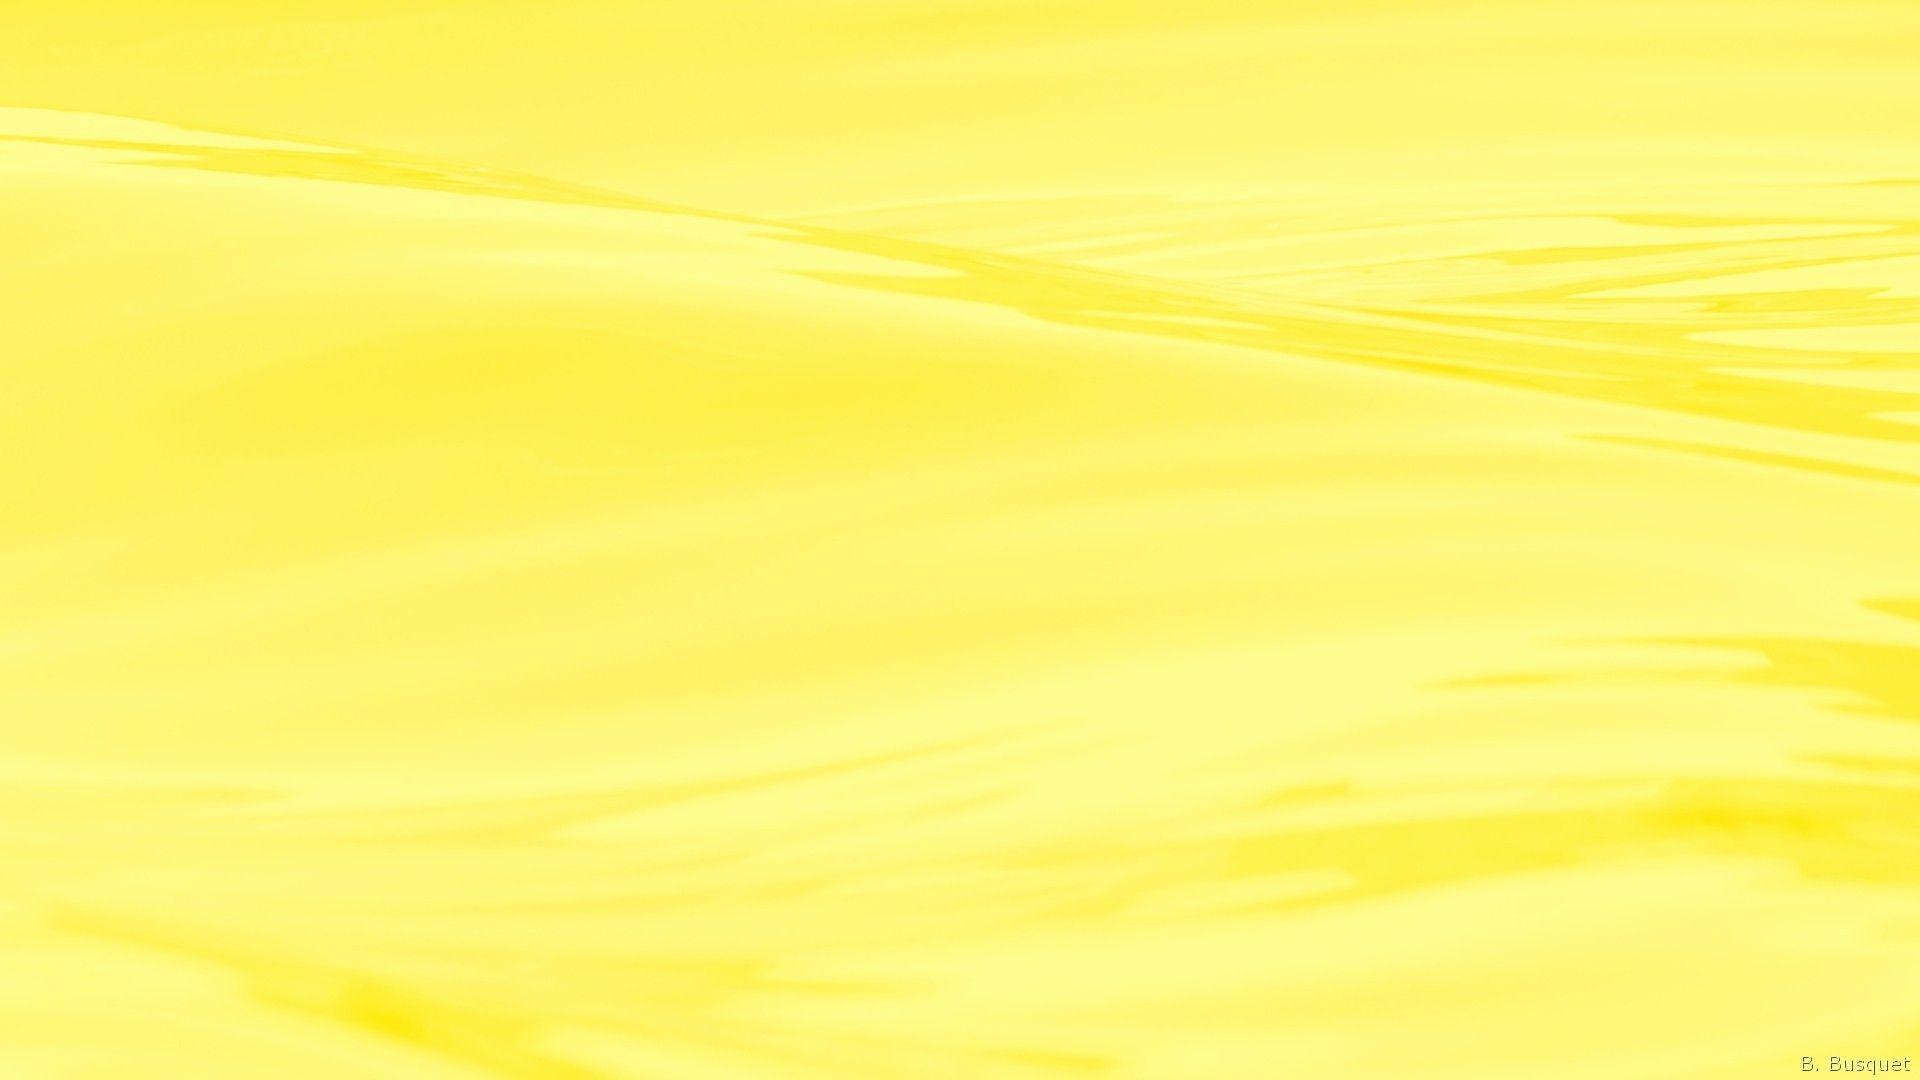 Aesthetic Yellow Laptop Wallpaper Yellow Wallpaper Yellow Aesthetic Pastel Laptop Wallpaper